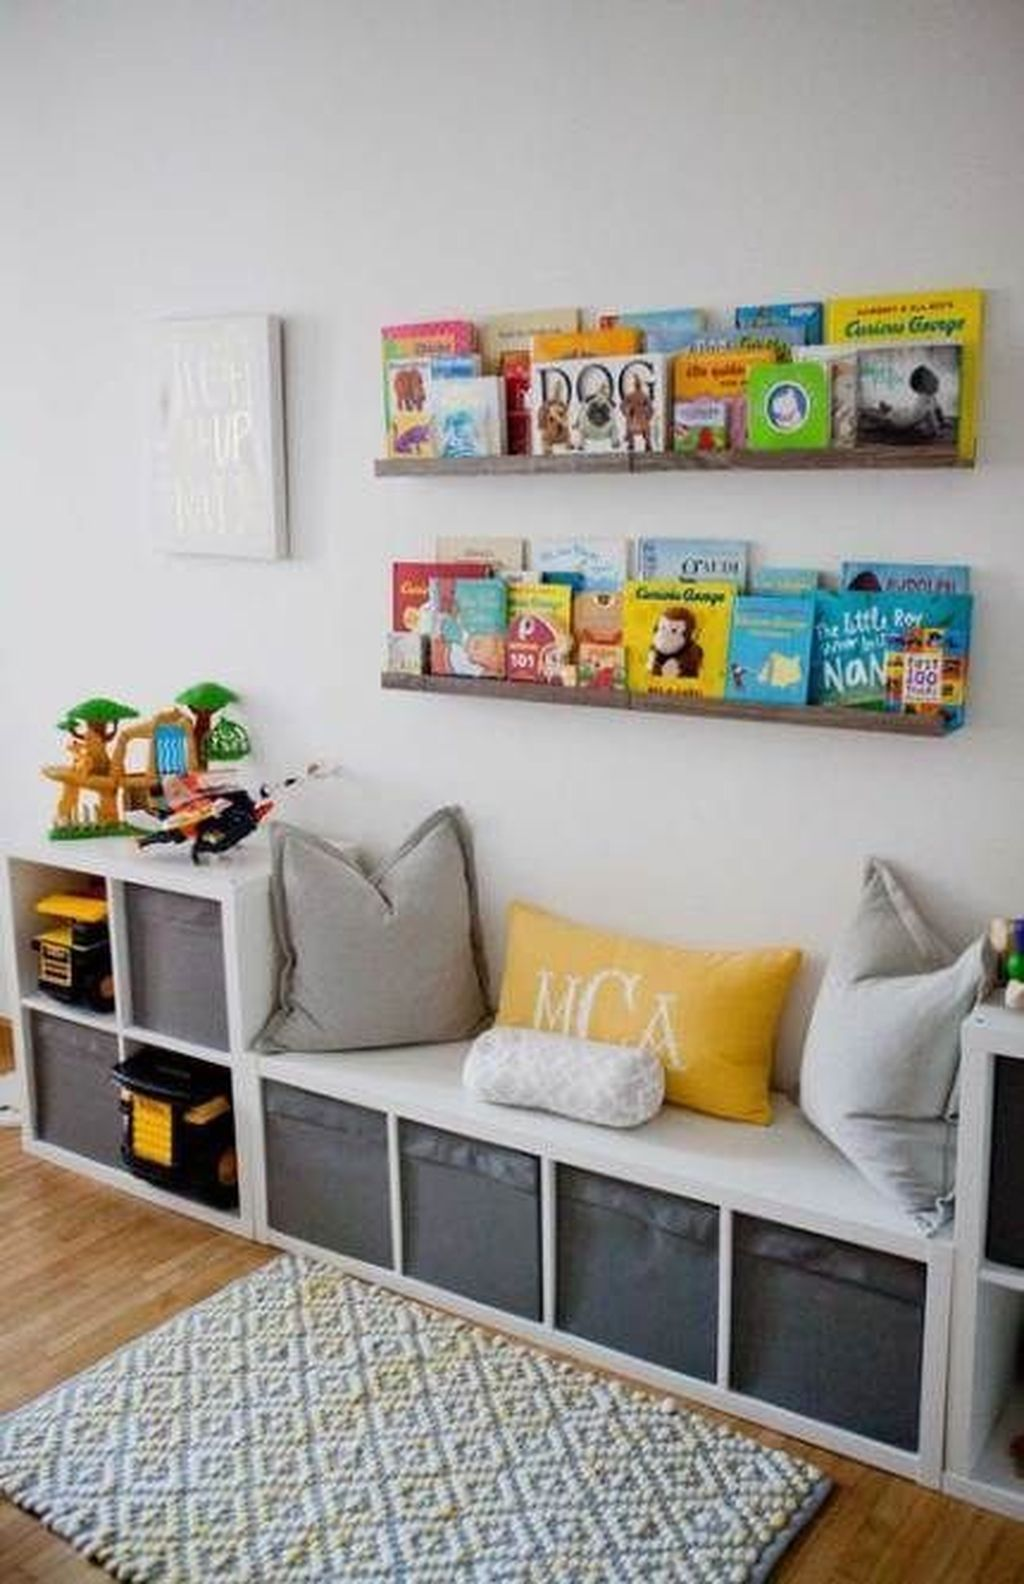 30 Inspiring Toy Storage Design Ideas Homyhomee Storage Kids Room Kids Room Shelves Small Kids Room